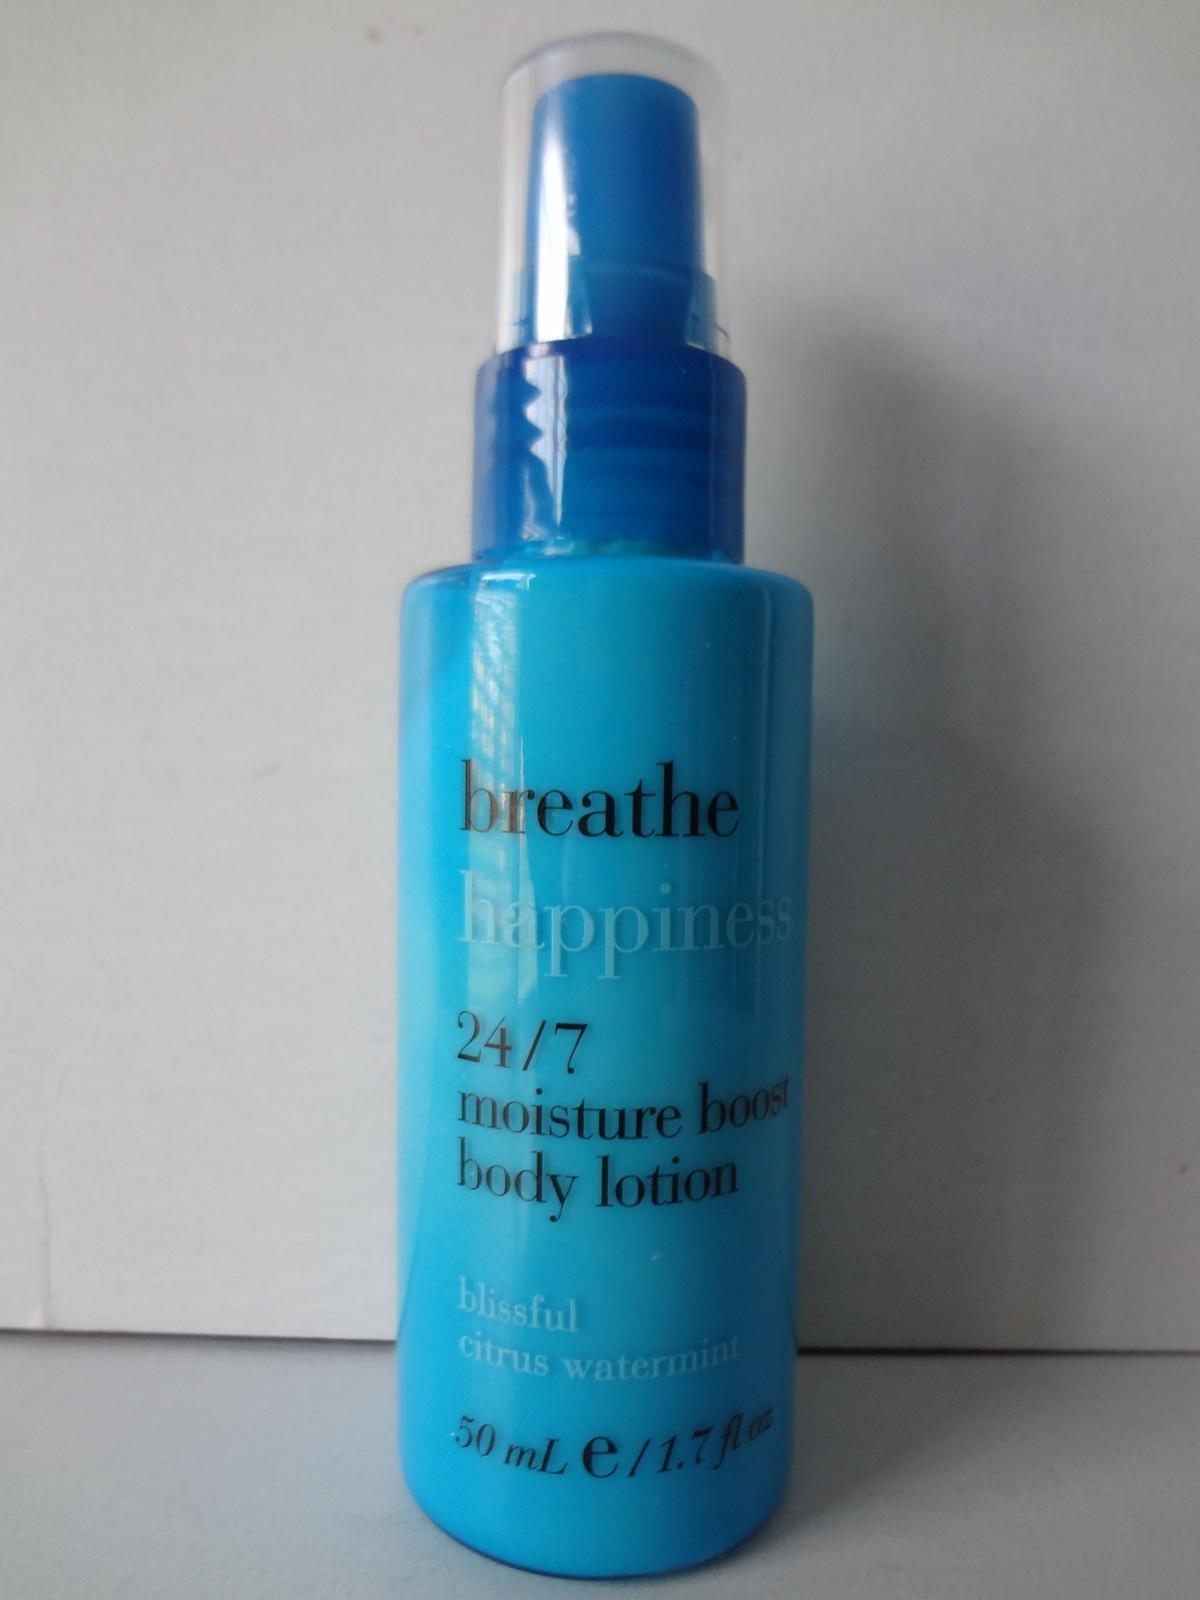 Bath & Body Works Breathe Happiness Blissful Citrus Watermint Body Lotion 1.7 oz